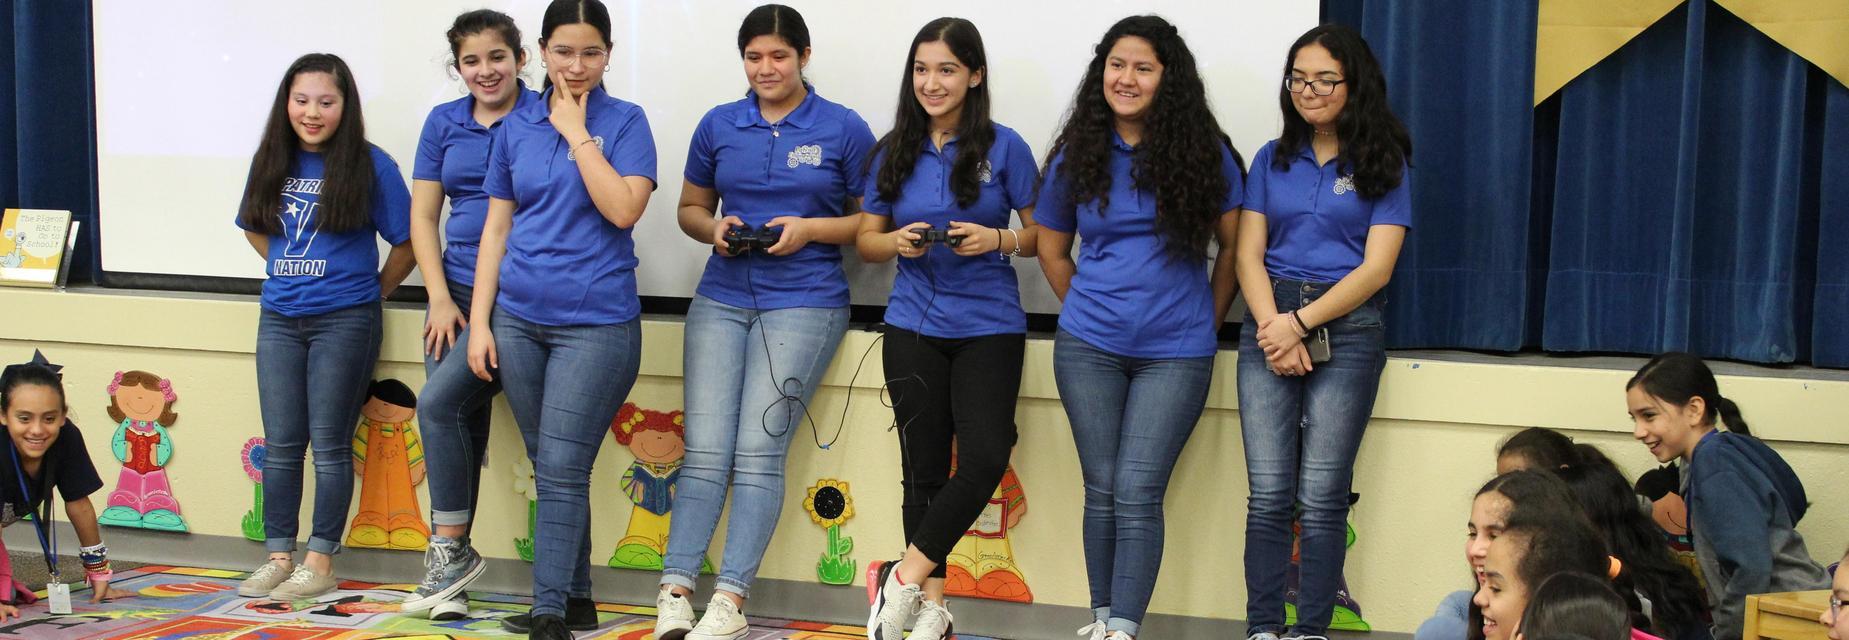 VMHS Stem Girls